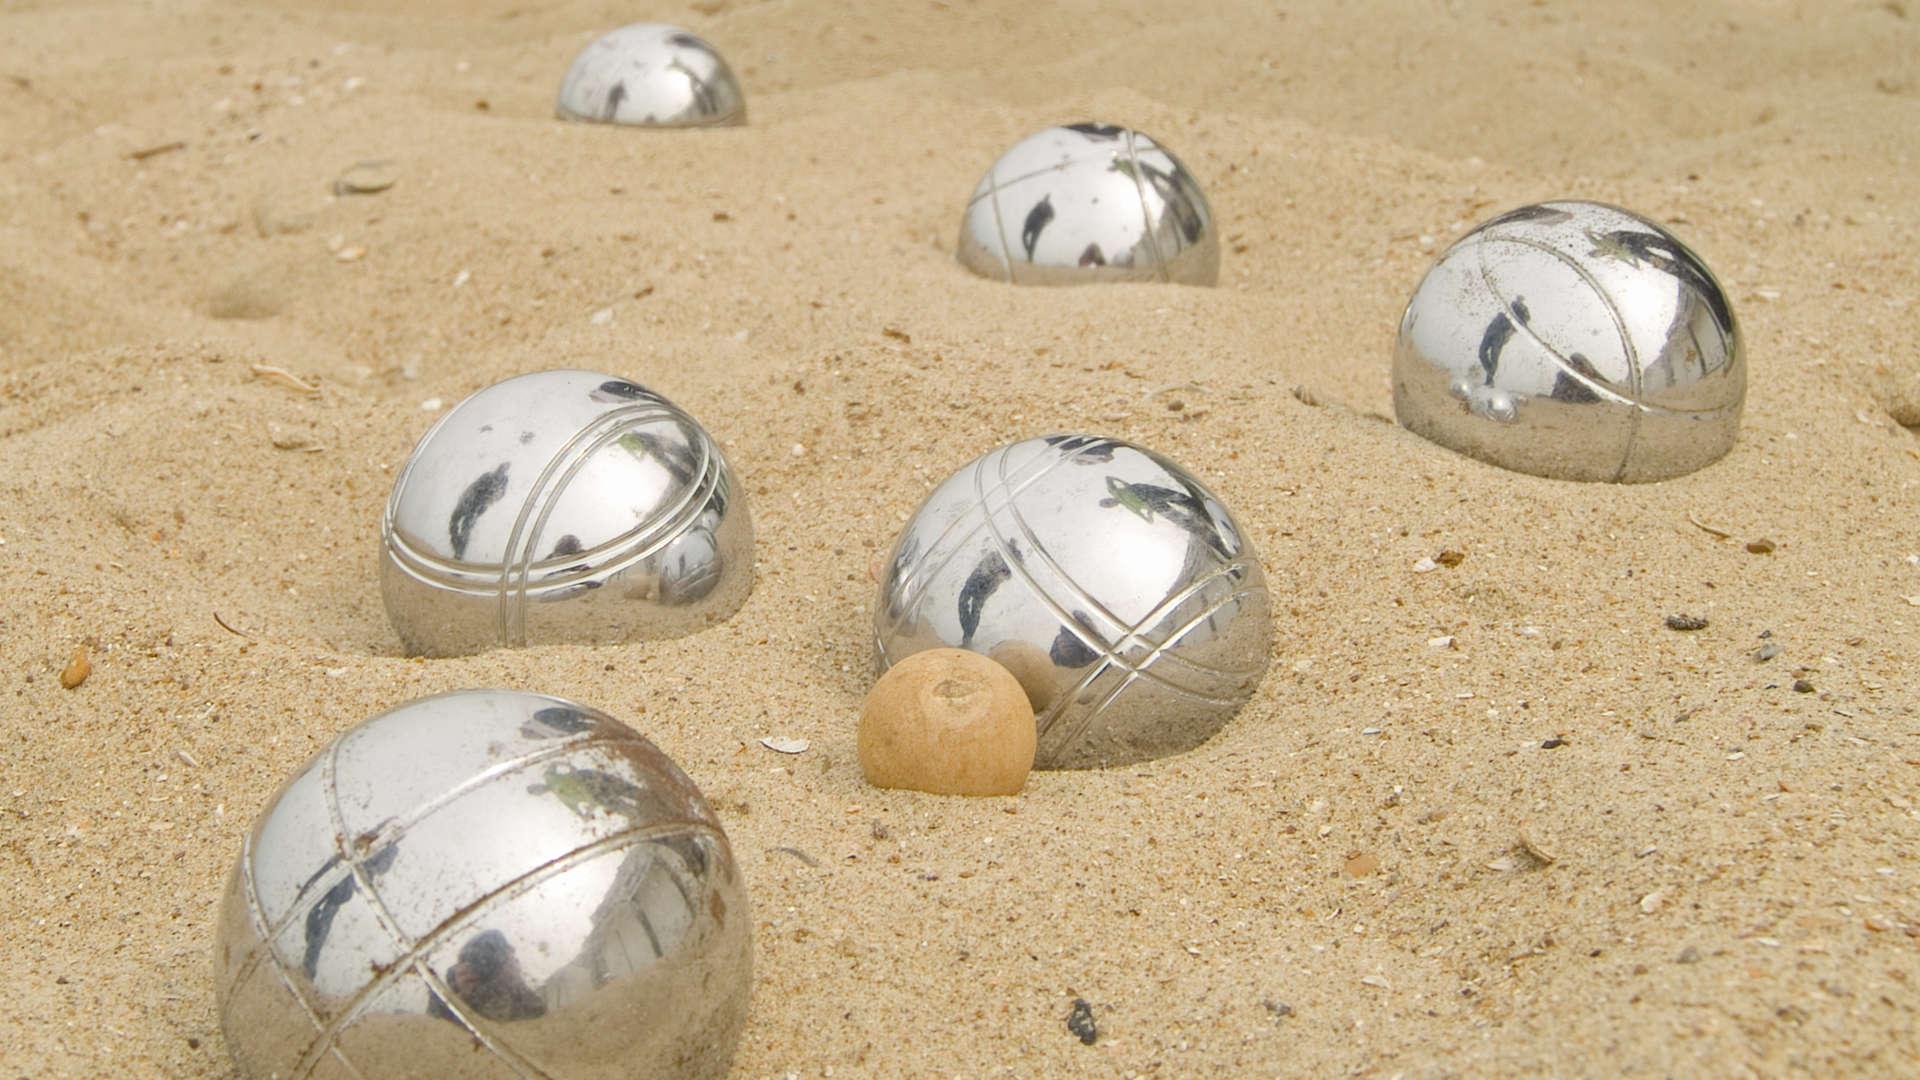 jeu de boules saam welzijnjeu de boules downloads full (1920x1080)